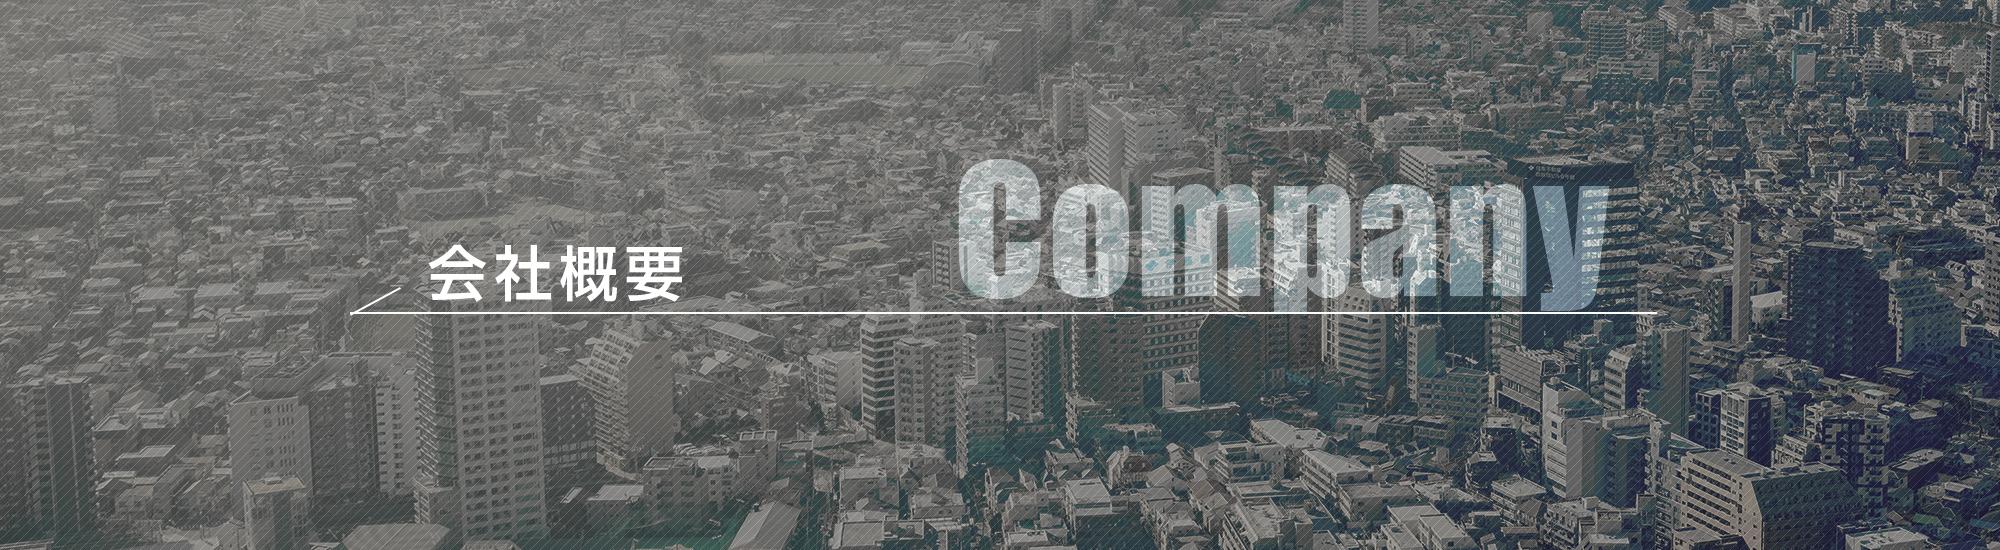 banner_big_company